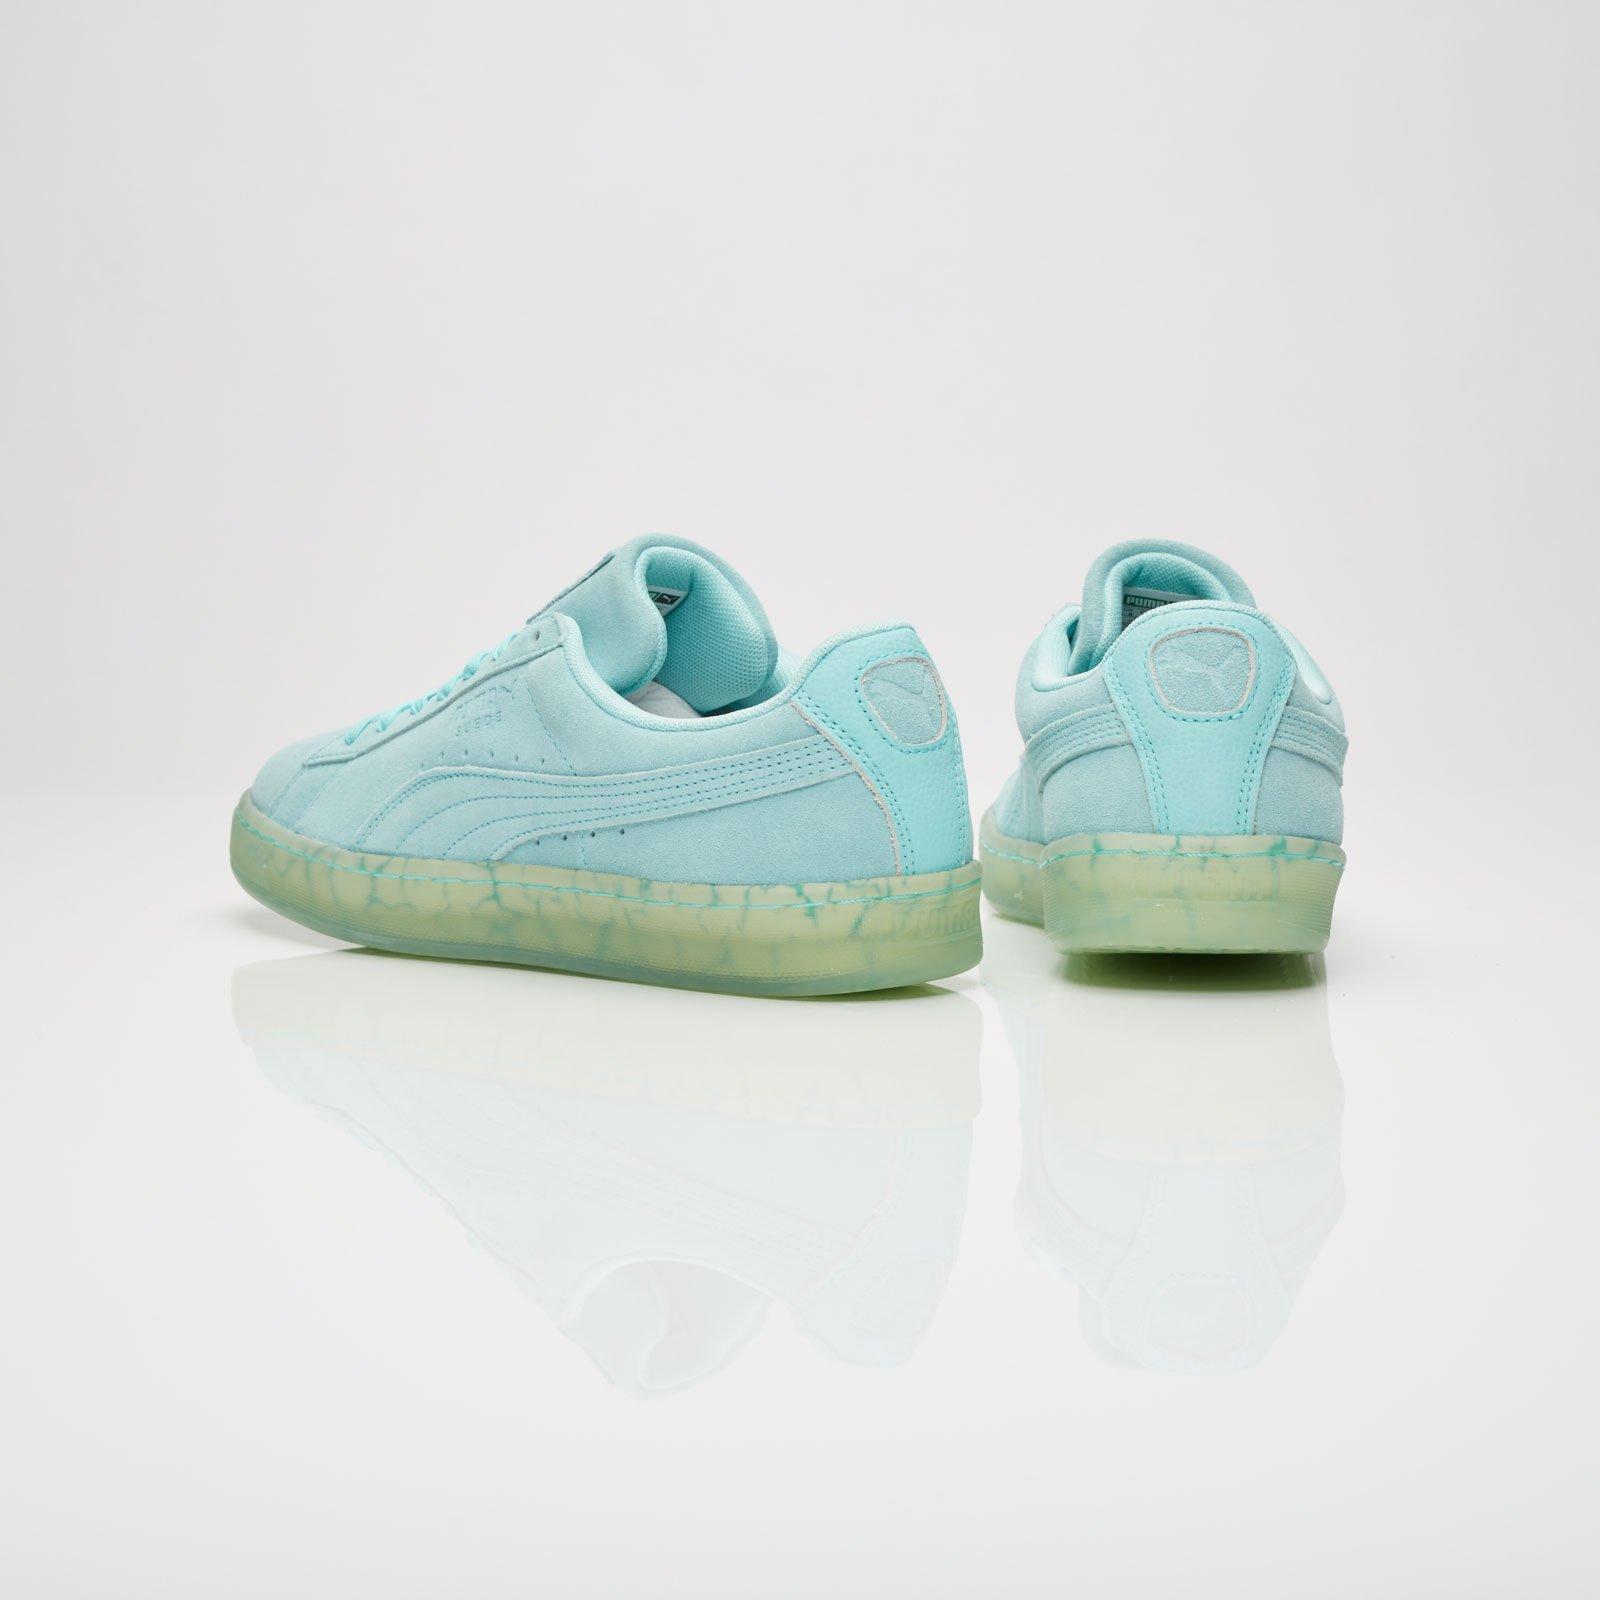 acheter populaire c7421 82ab5 Puma Suede Classic Easter FM - 362556-01 - Sneakersnstuff ...